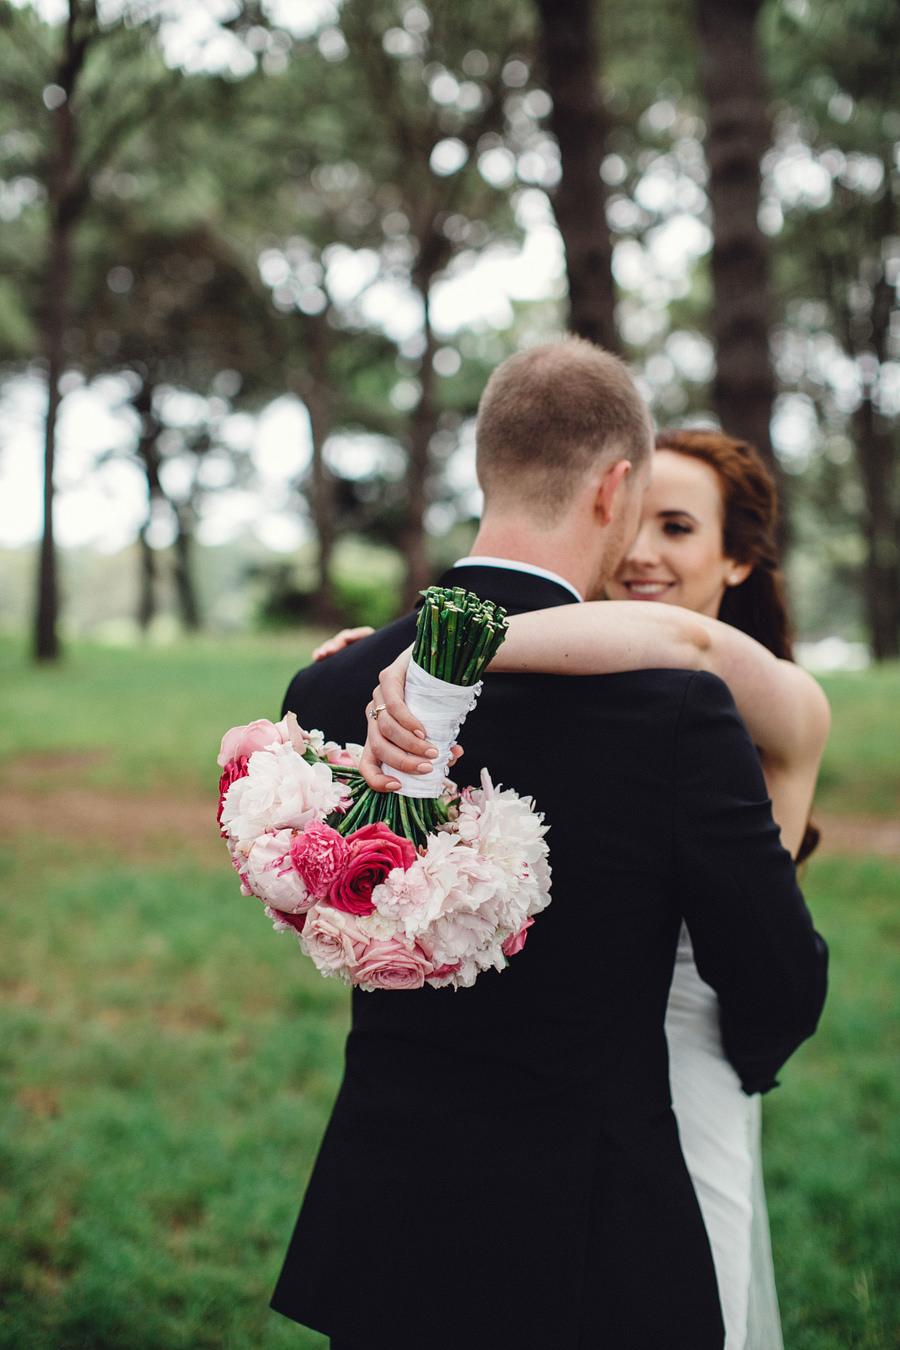 Centennial Park Sydney Wedding Photographers: Bridal Party Portraits